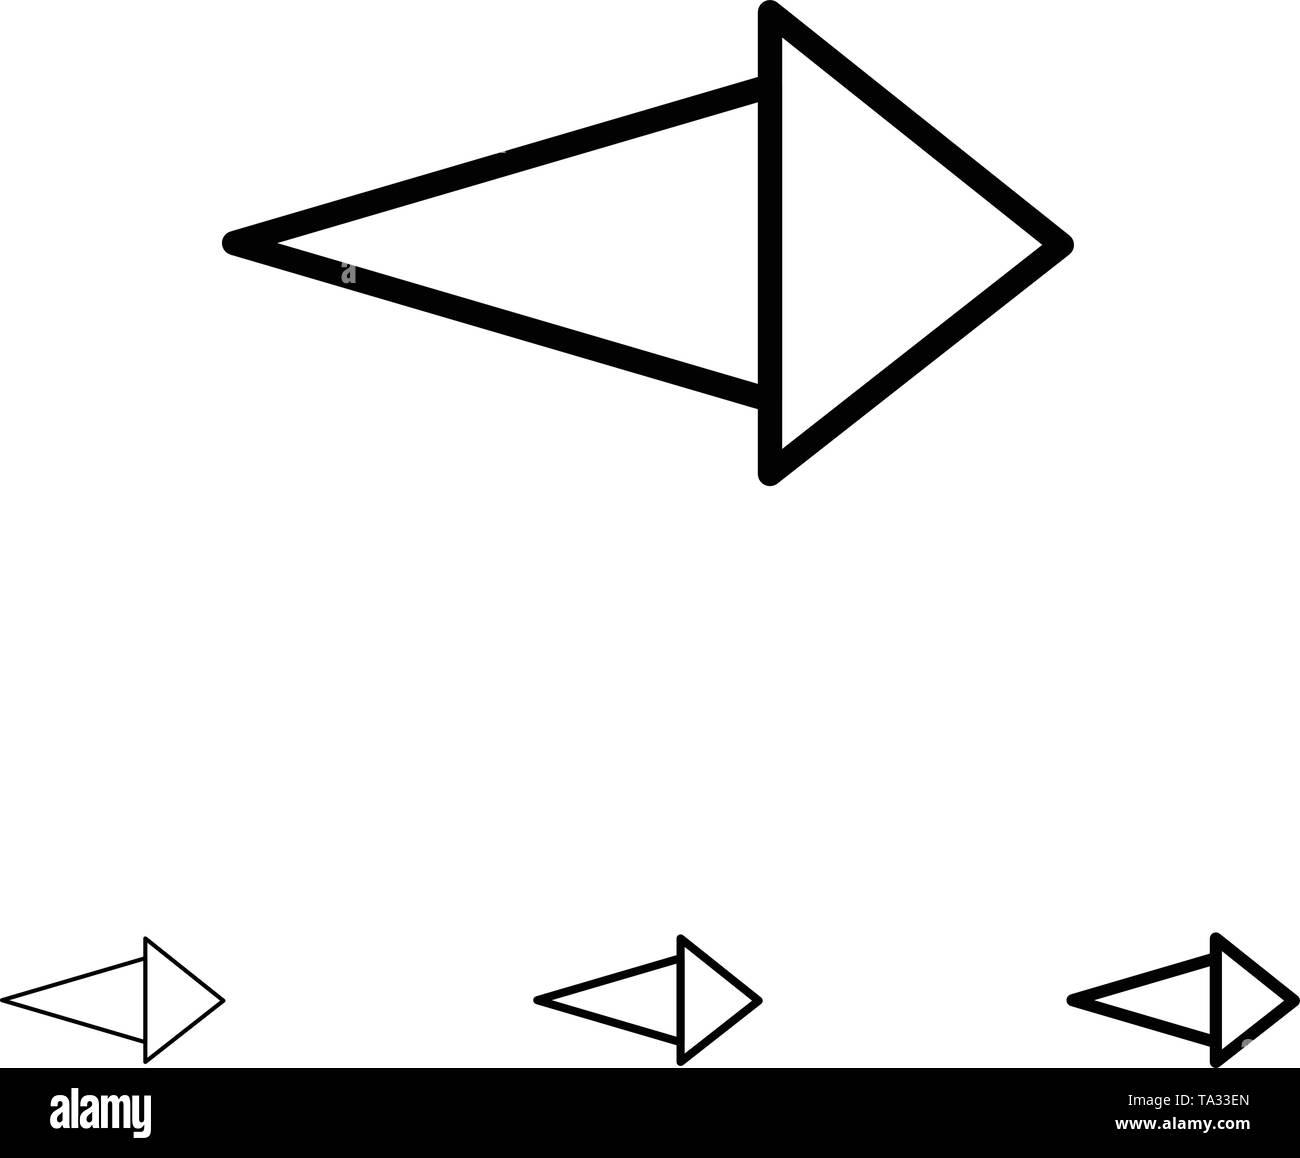 Arrow, Right, Next Bold and thin black line icon set - Stock Image